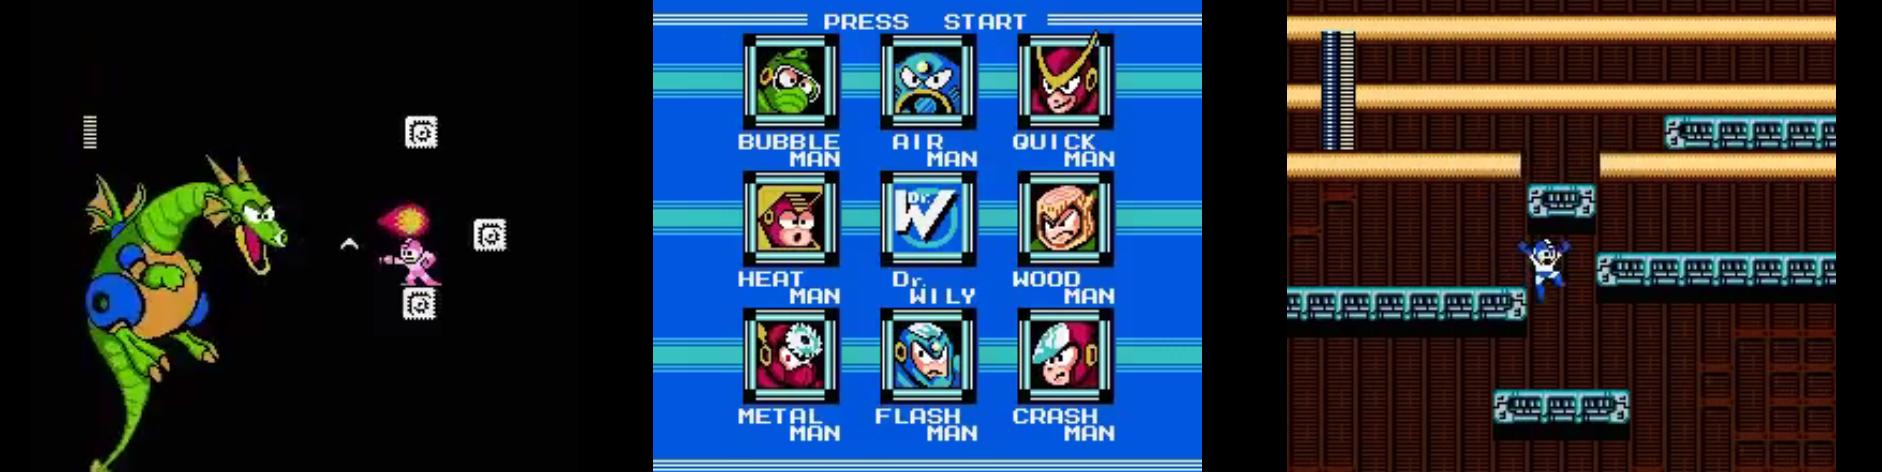 przegląd megaman na NES pegasus